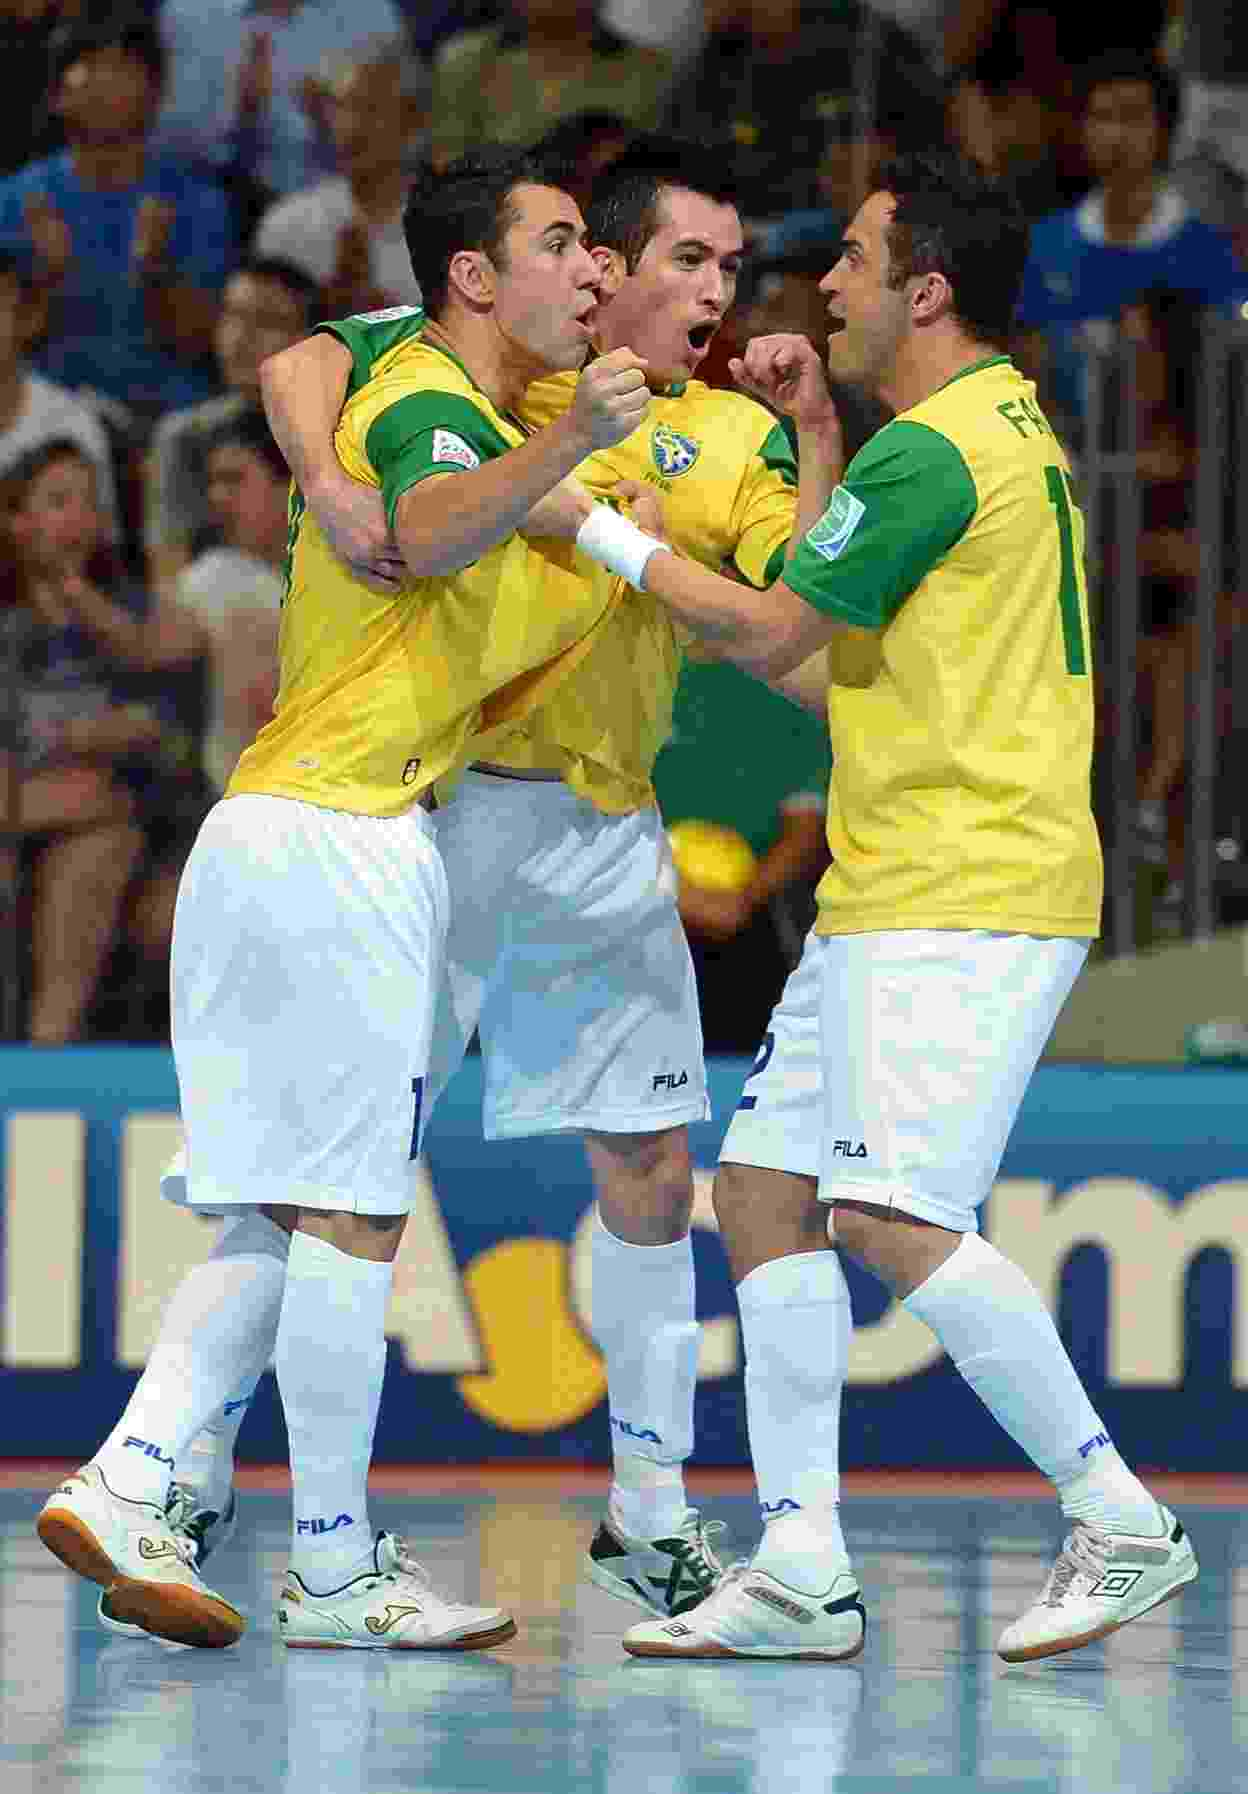 27bccede49 Último dia da Copa do Mundo de futsal